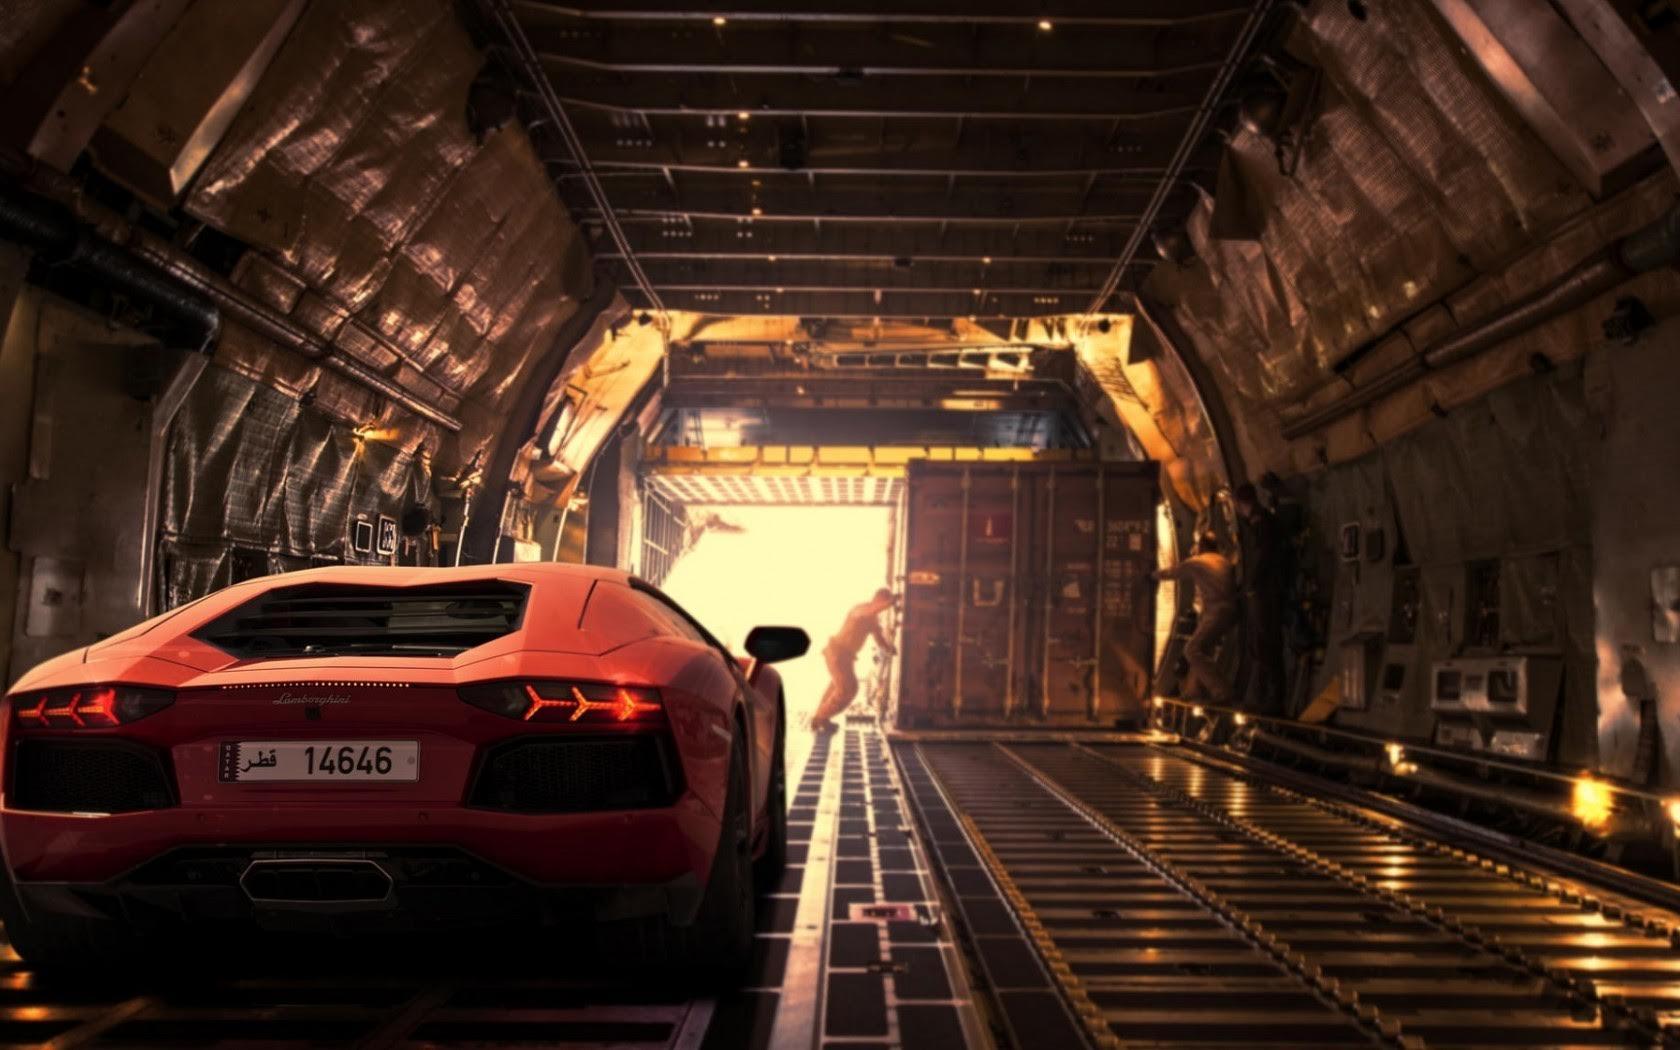 Ship Lamborghini Aventador by air freight service